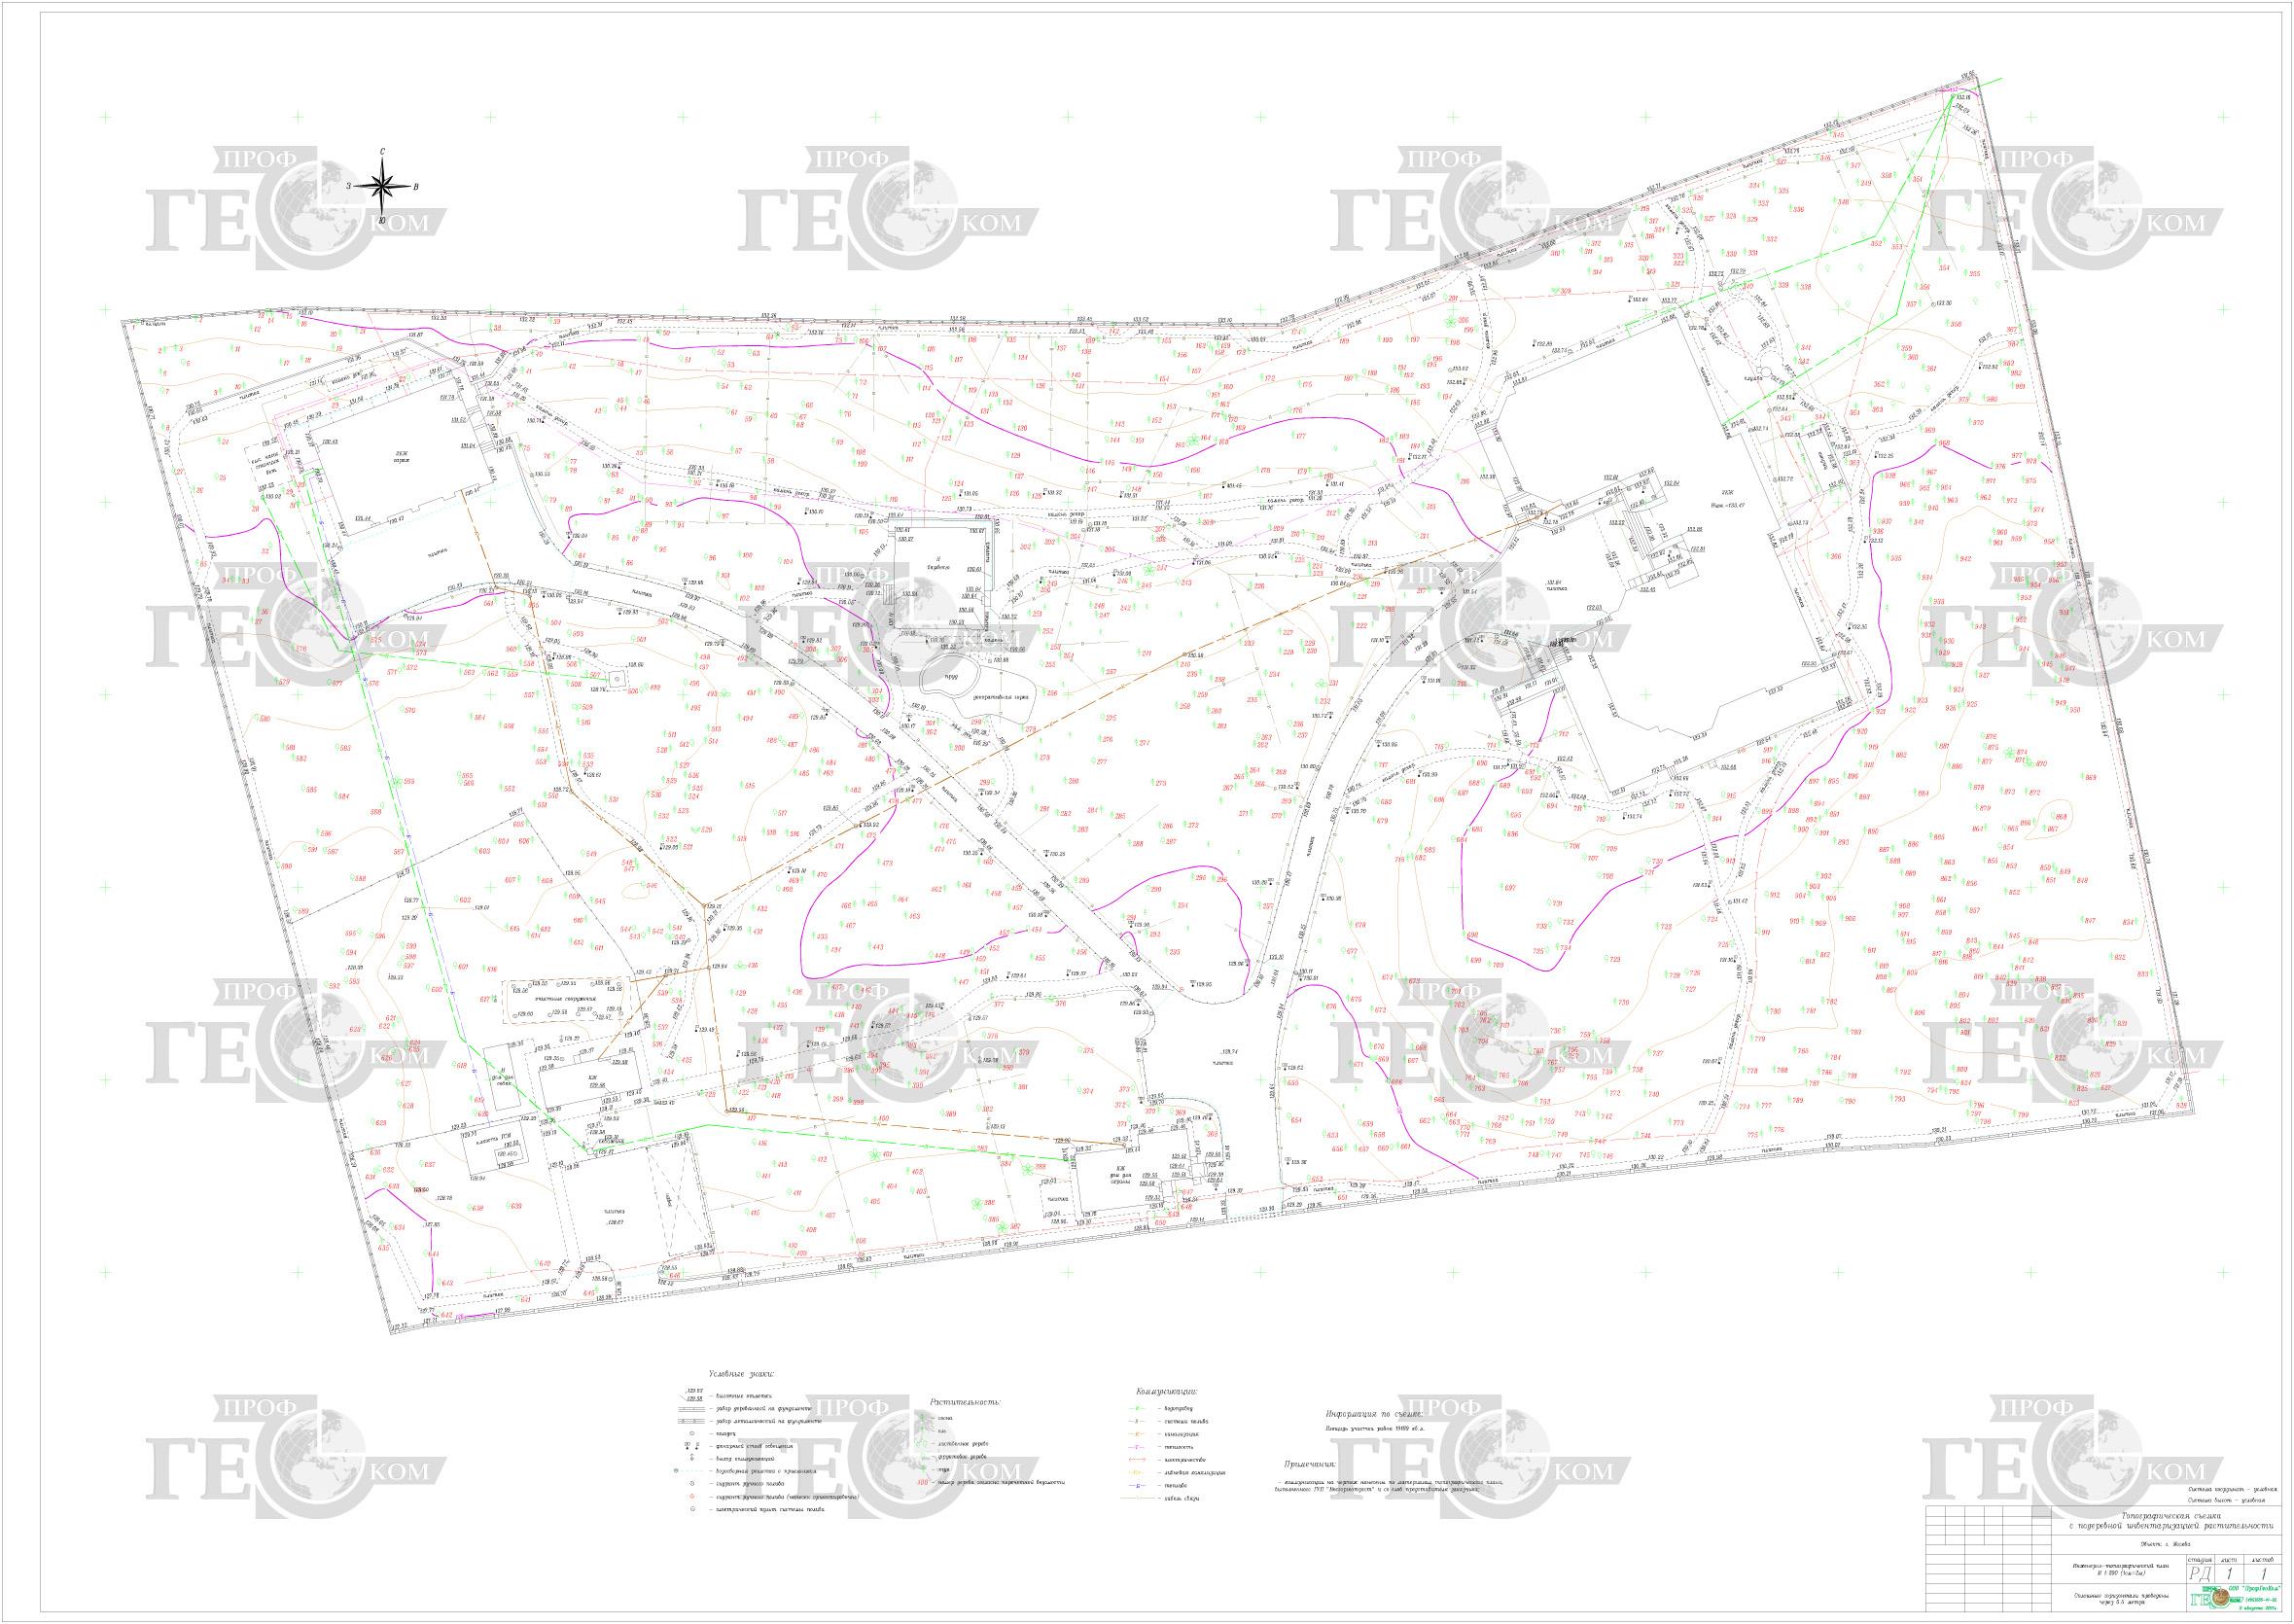 Инструкция по топографическим съемкам в масштабе